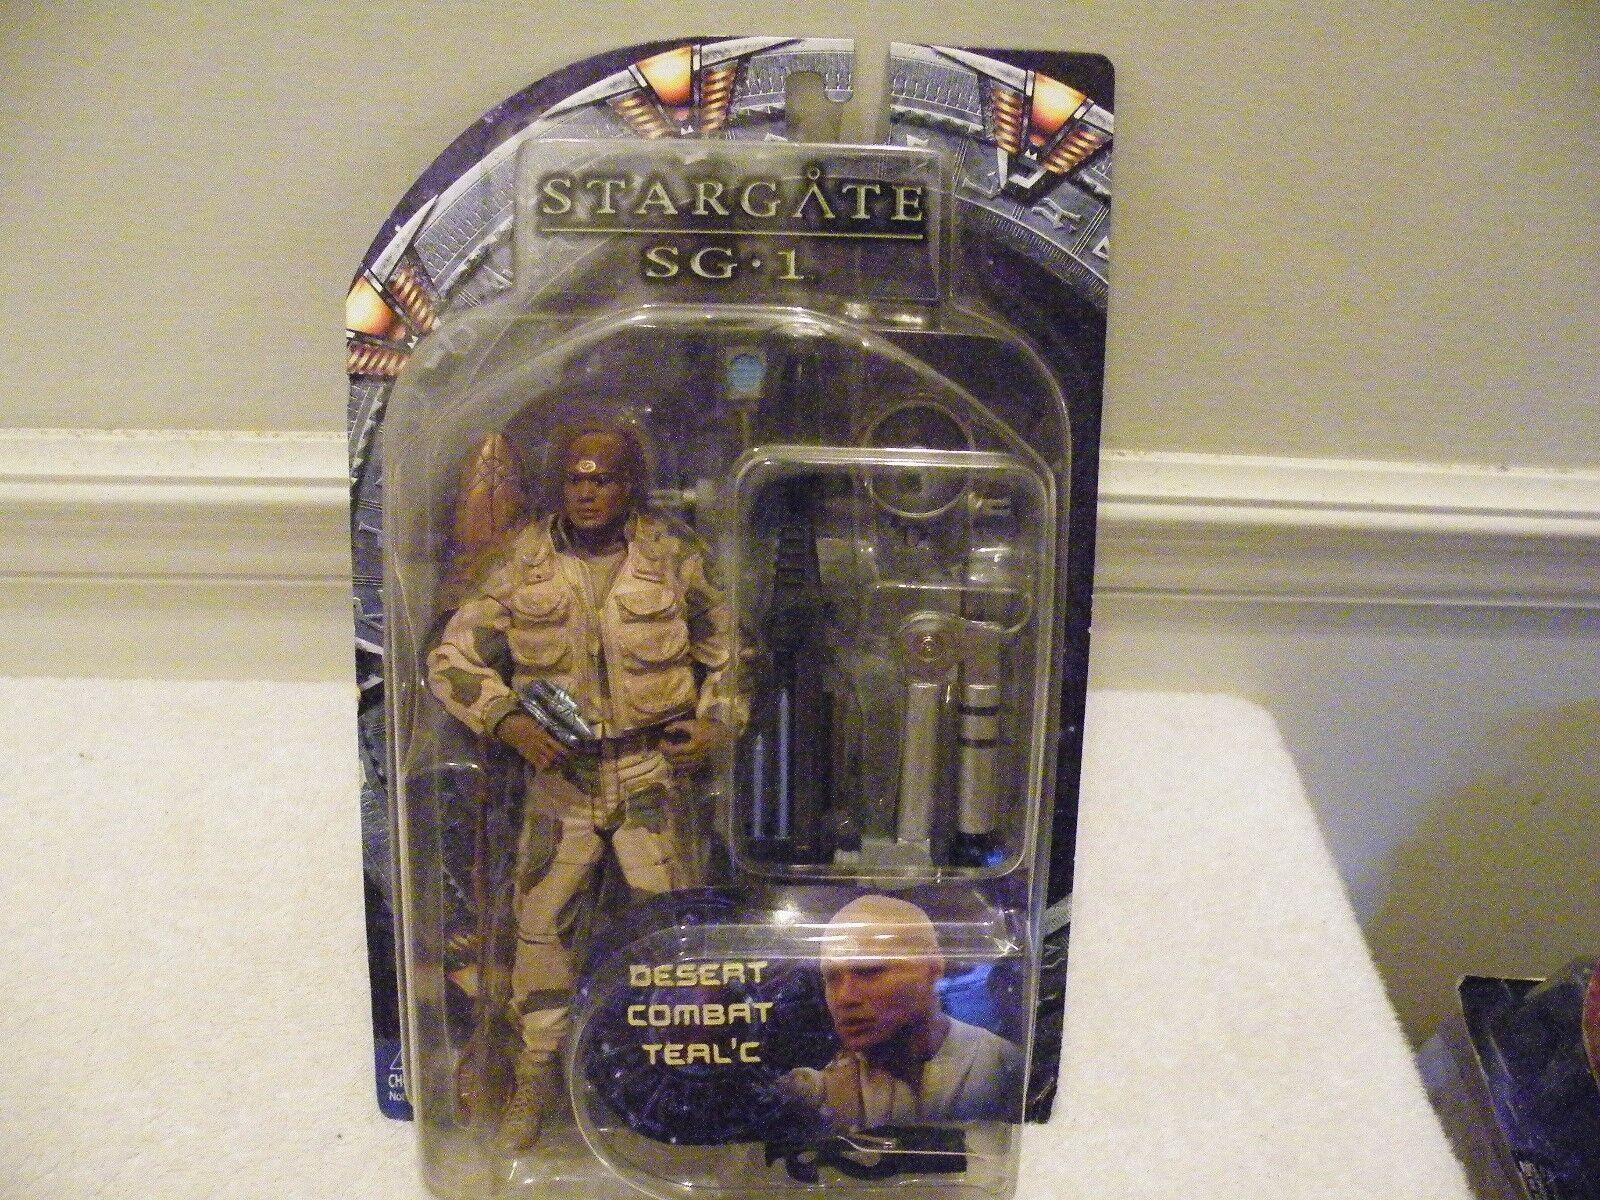 Stargate - wüste bekämpfung teal 'c abbildung moc